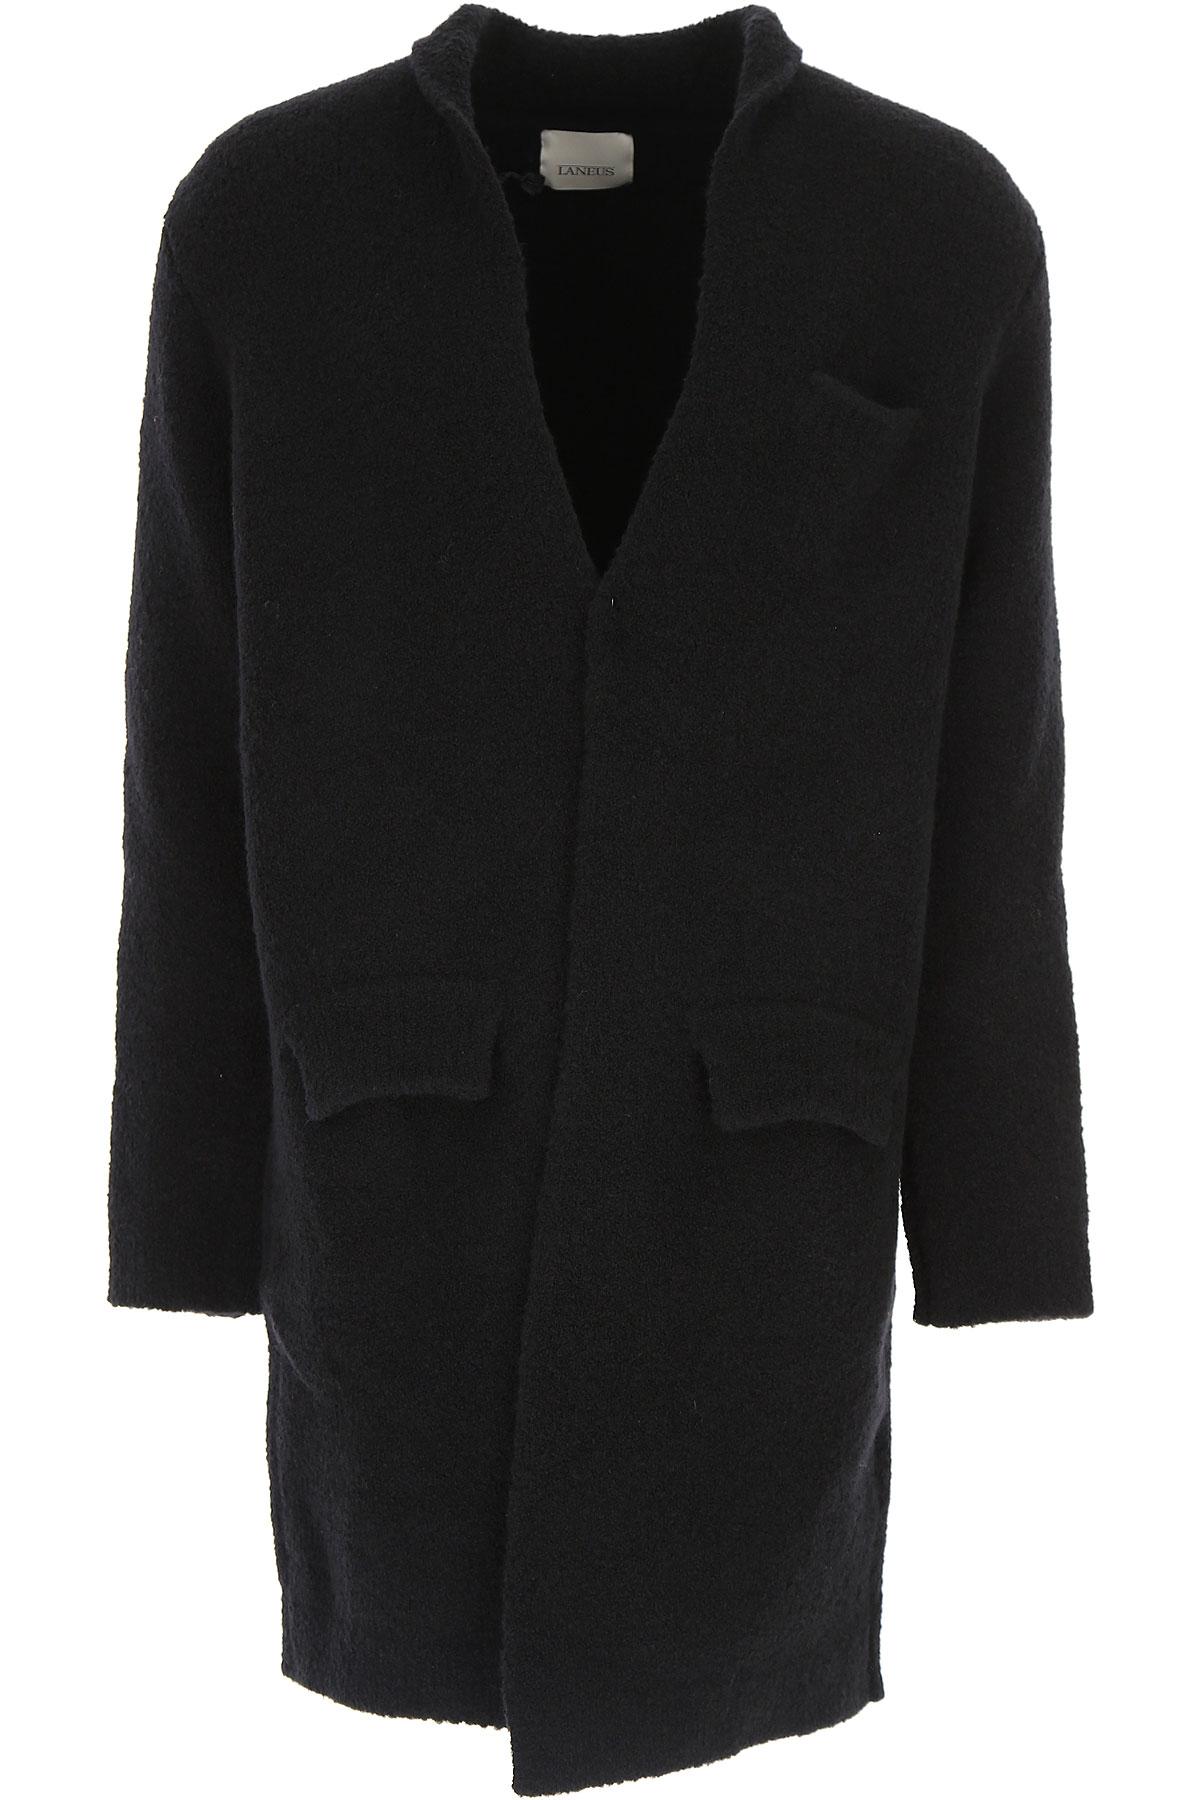 Image of Laneus Men\'s Coat, Black, merino wool, 2017, L XL